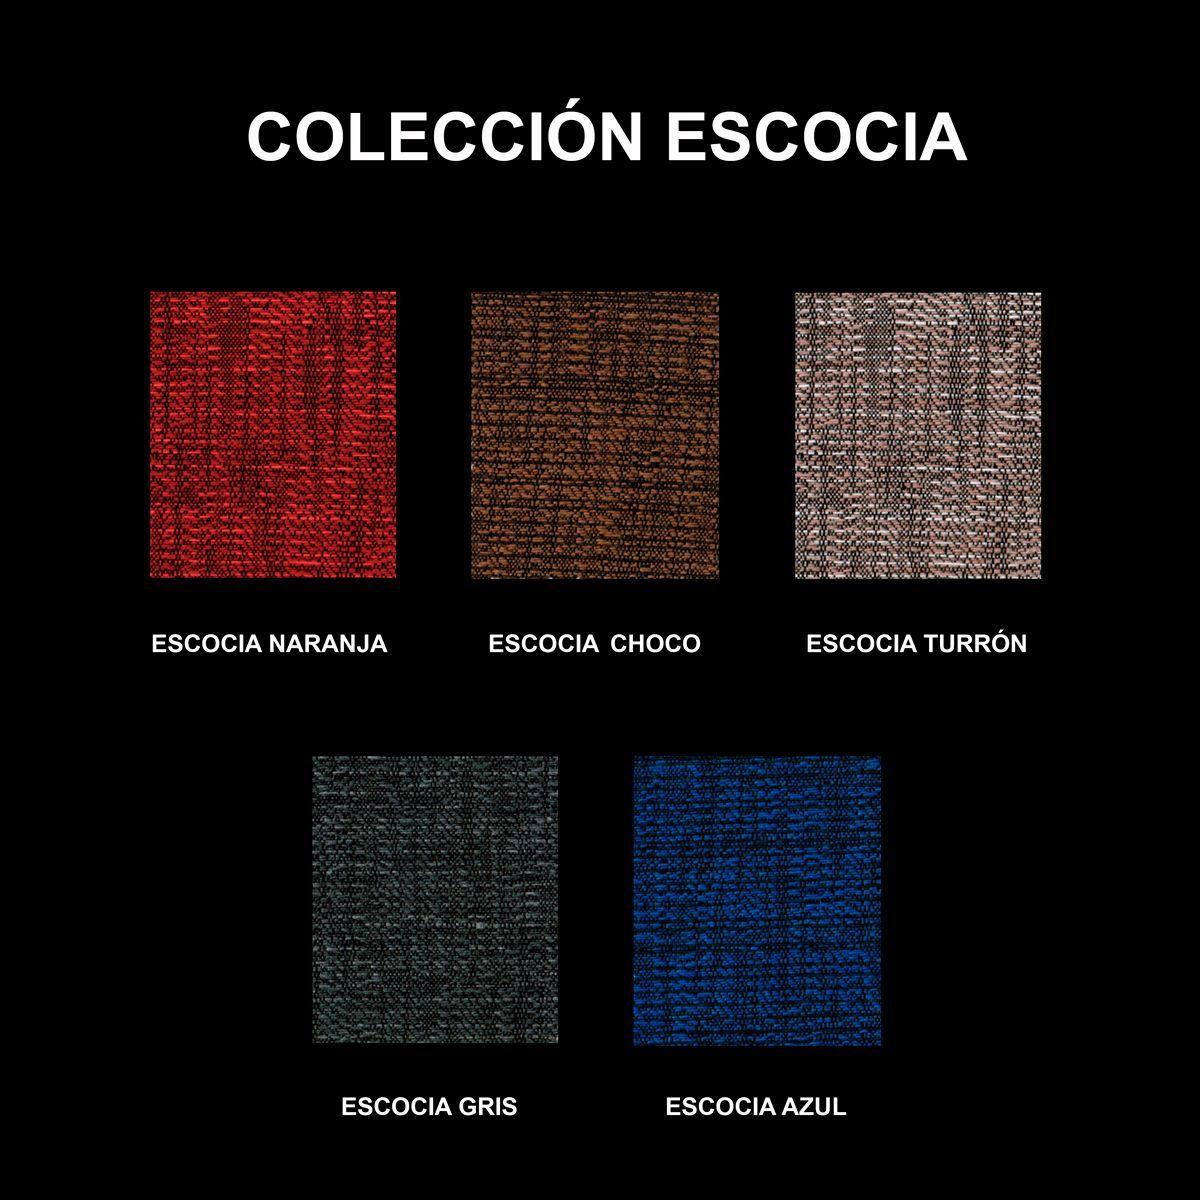 COLECCION-ESCOCIA-BAJA